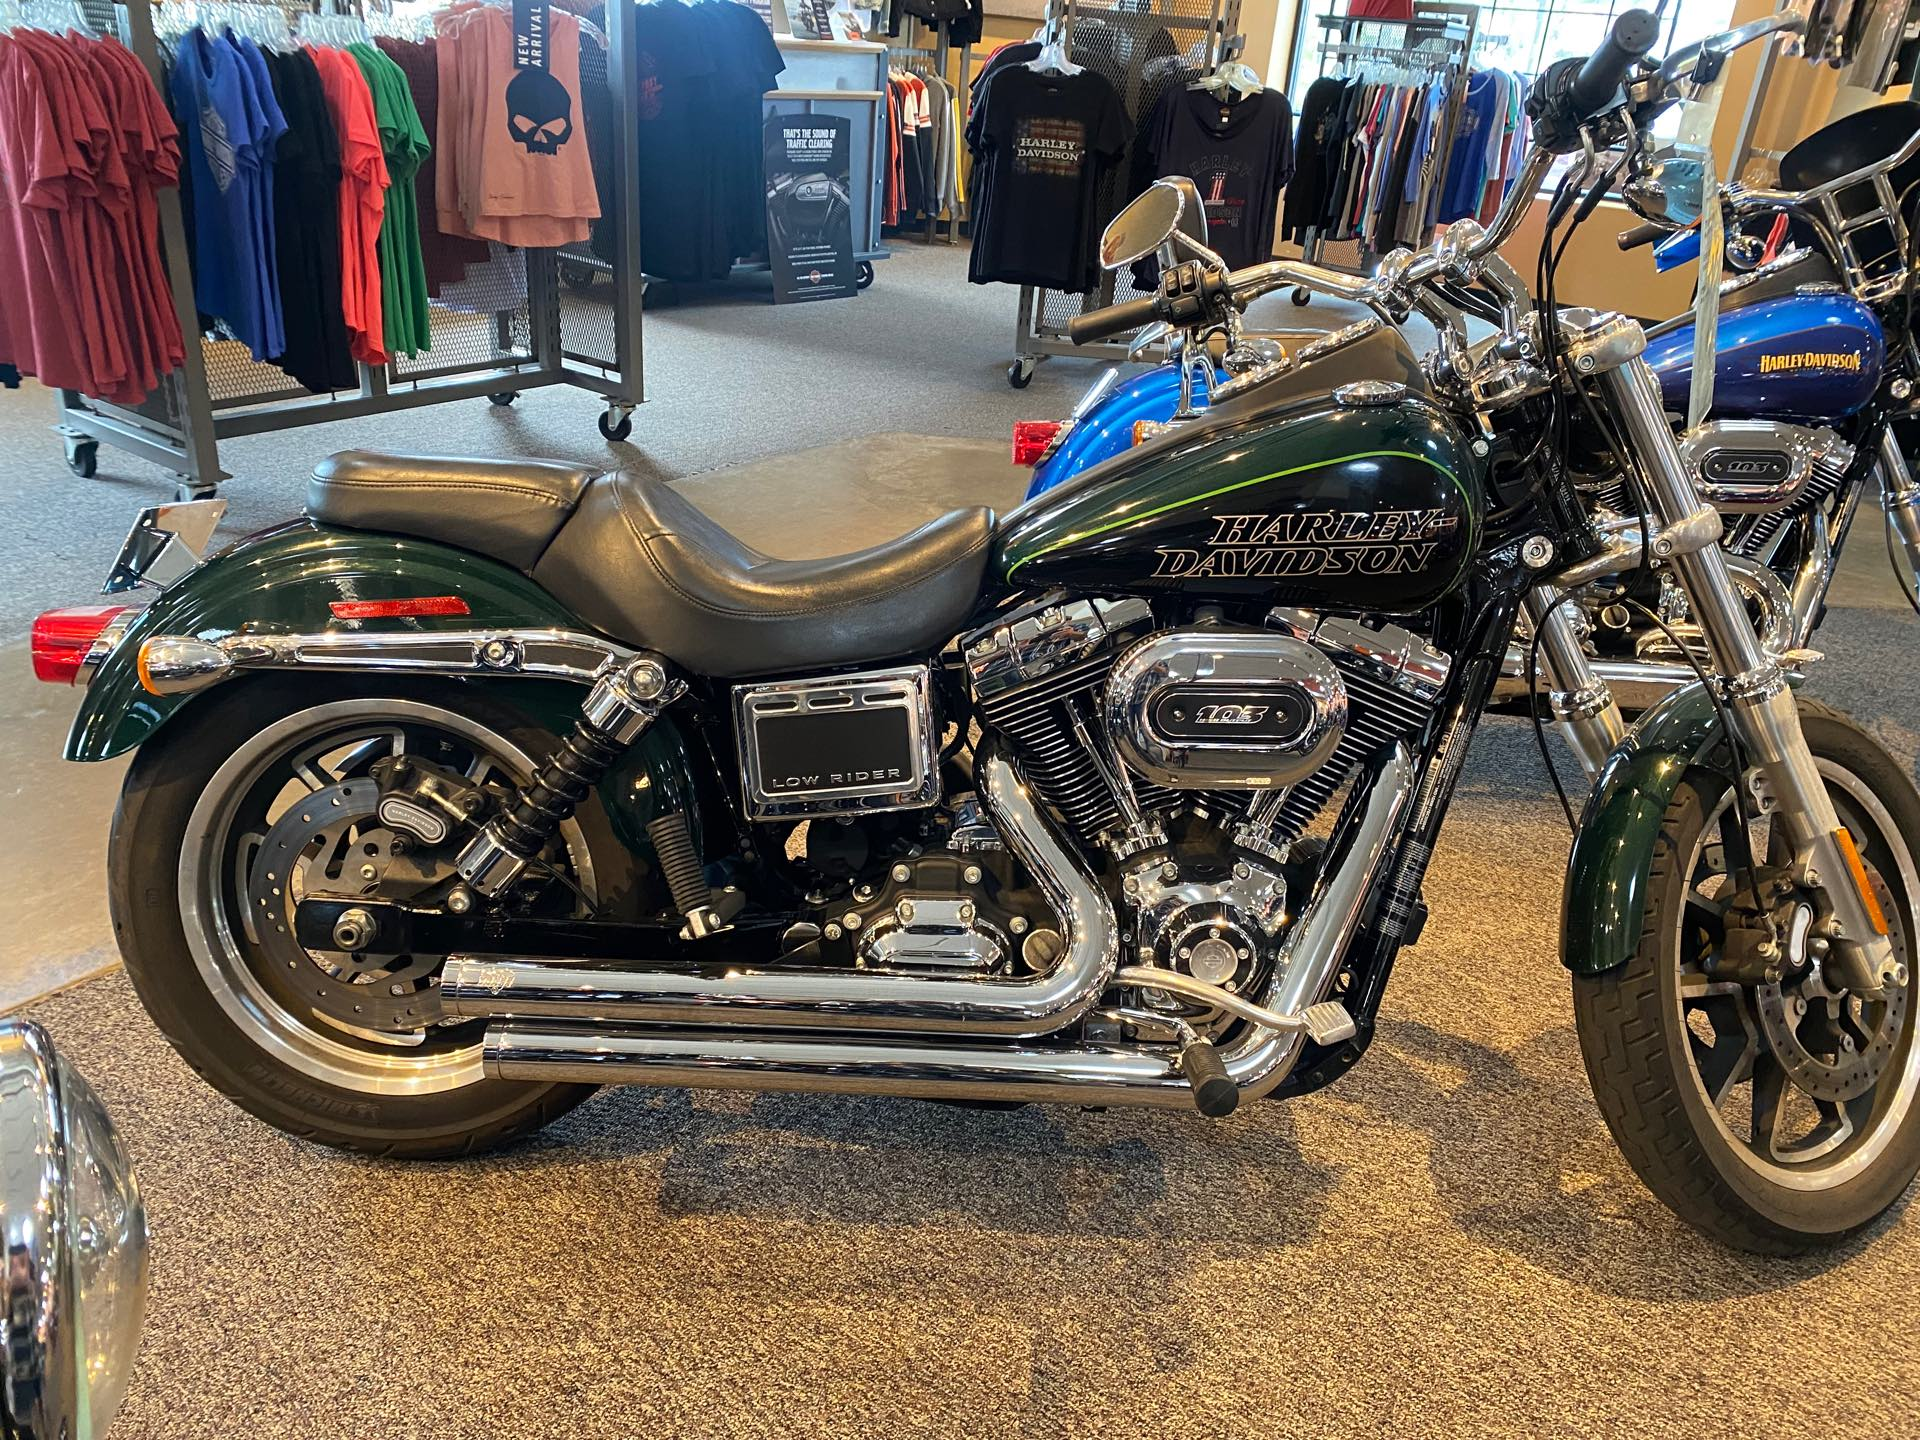 2016 Harley-Davidson Dyna Low Rider at Outpost Harley-Davidson